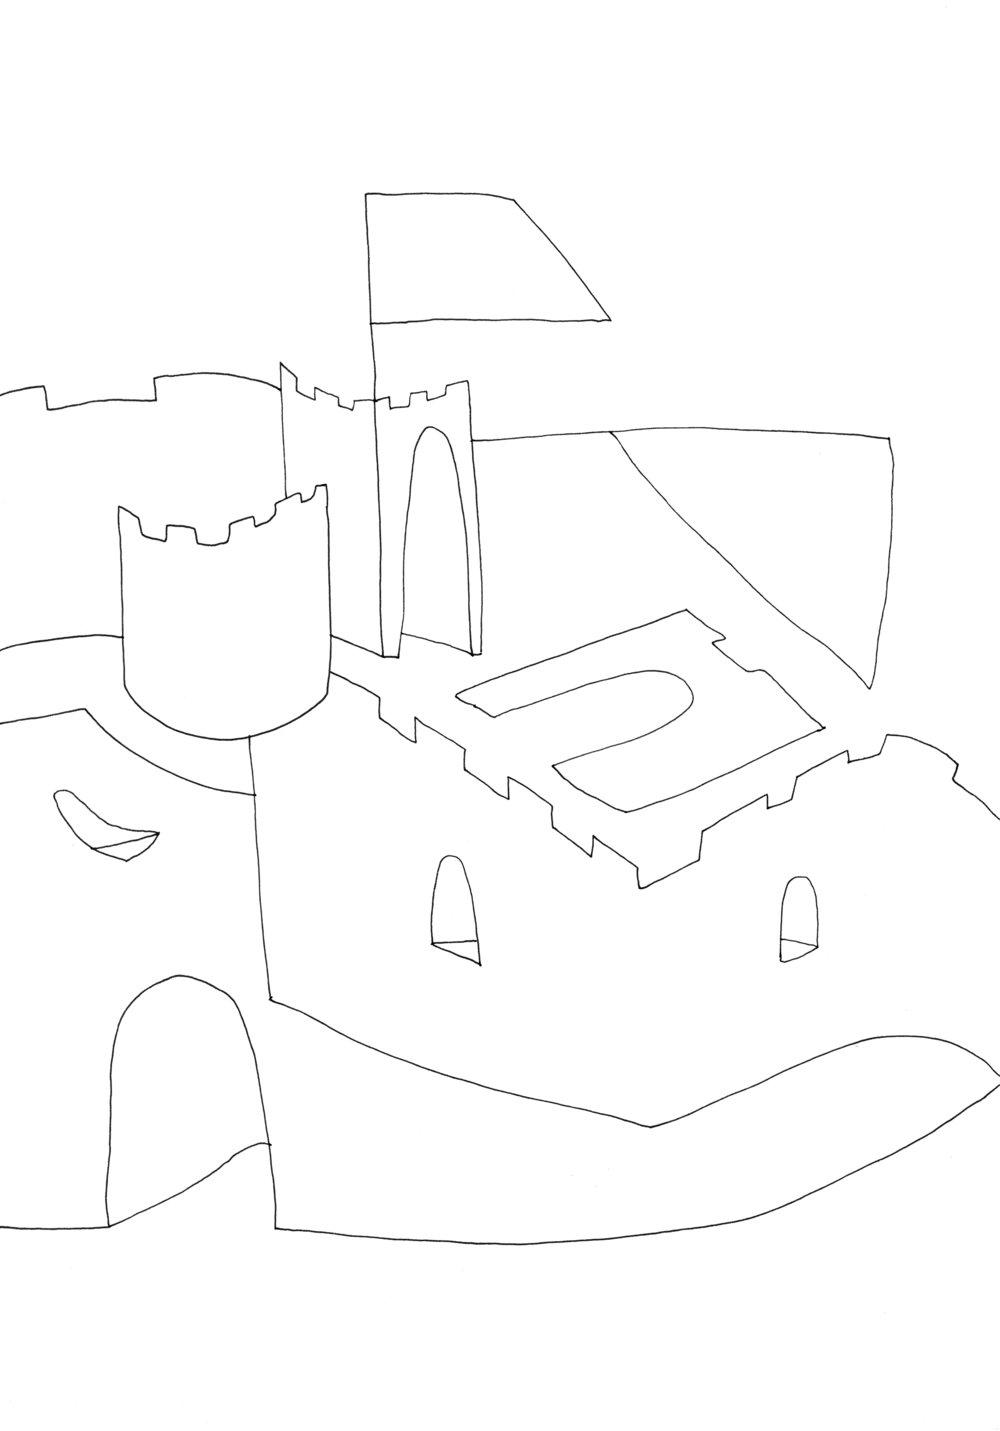 juliet furst SHP line 5.jpg